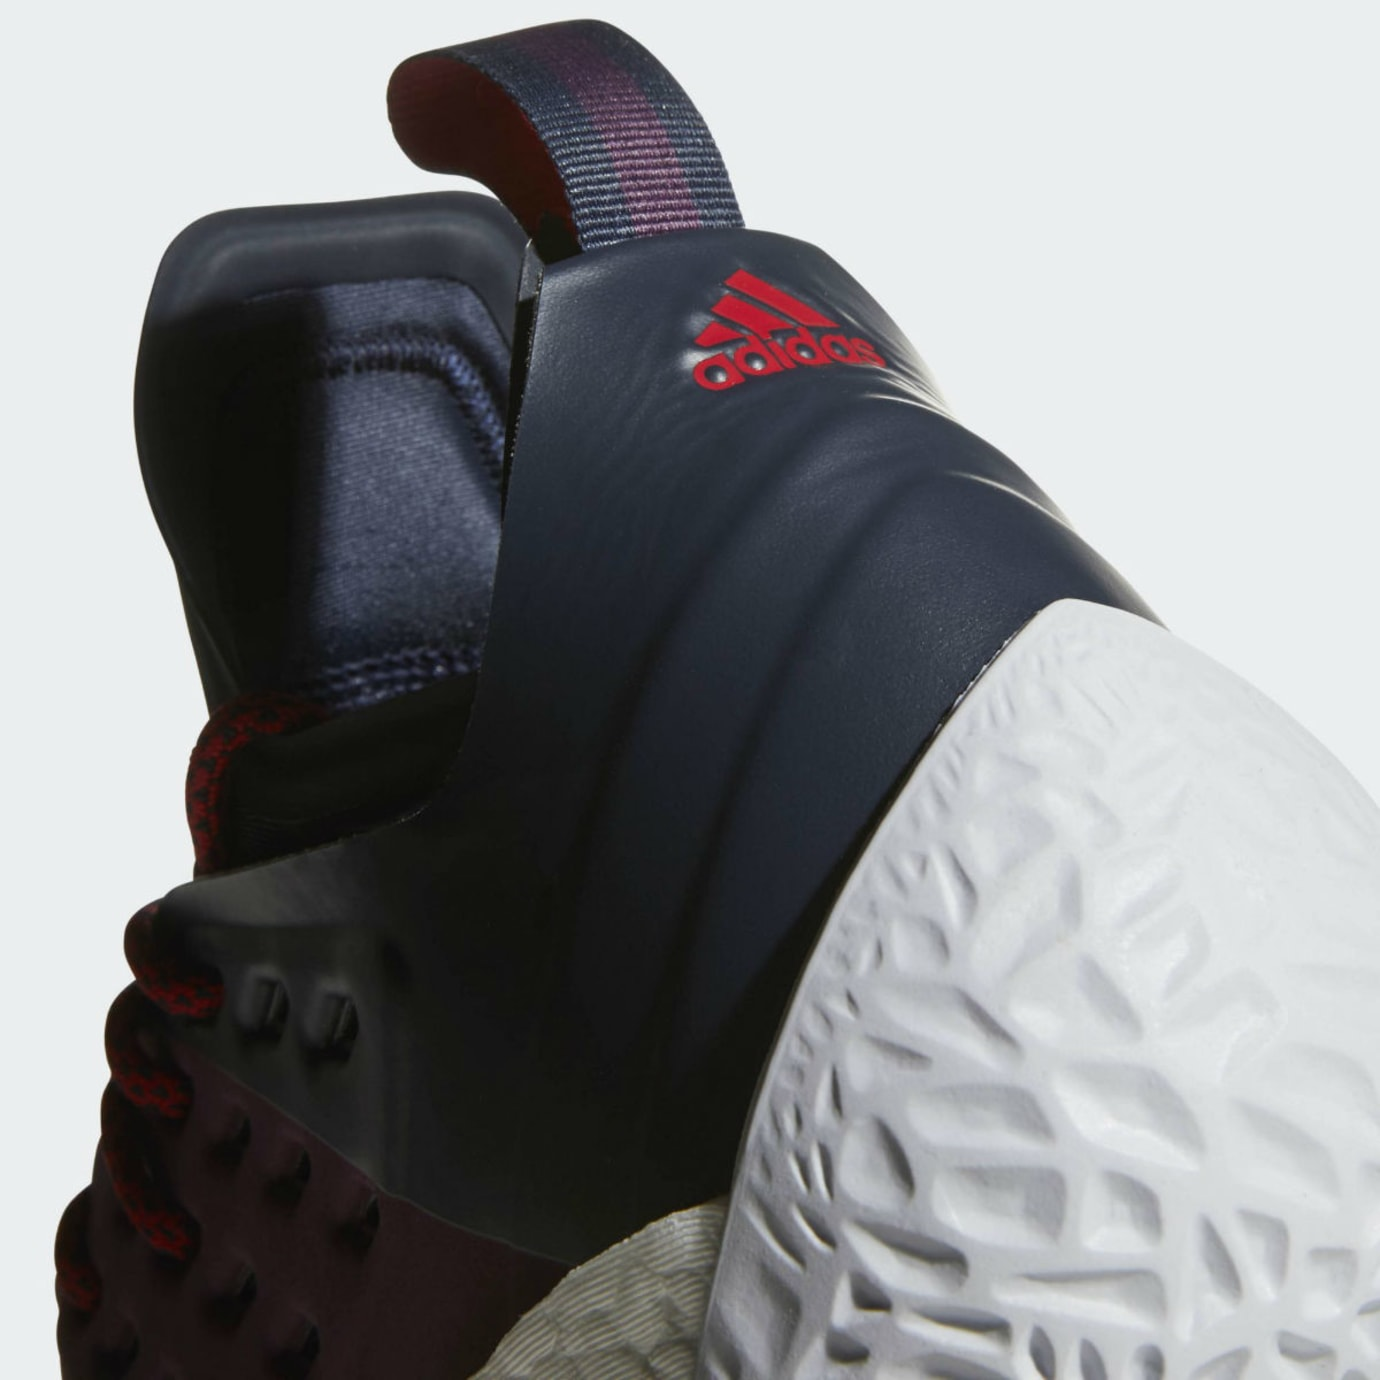 Adidas Harden Vol. 2 Maroon Release Date AH2124 Back